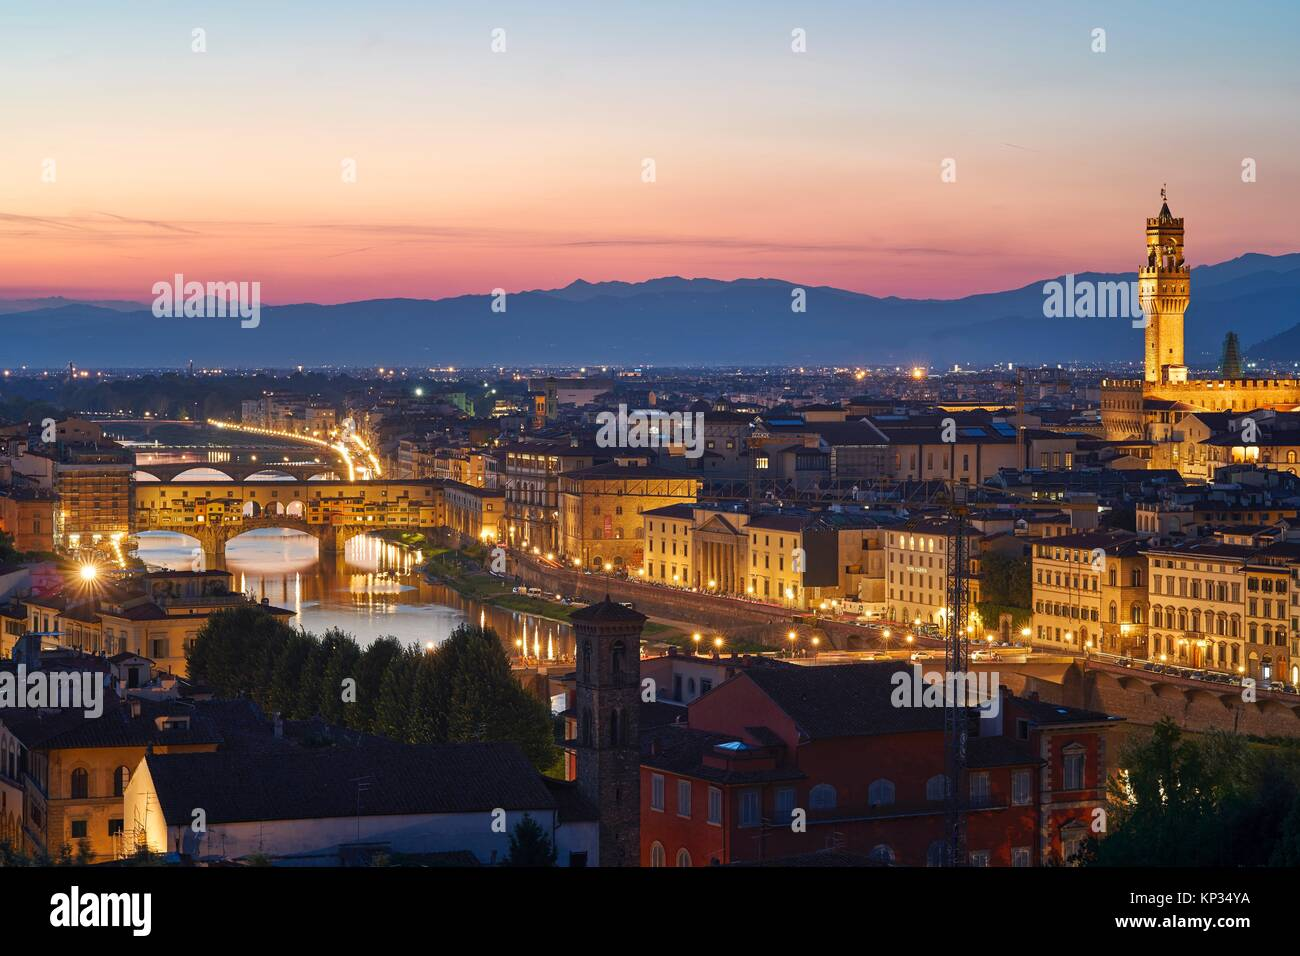 Florenz Stadtbild bei Sonnenuntergang mit dem Palazzo Vecchio (Alter Palast) und dem Fluss Arno. Toskana, Italien Stockbild